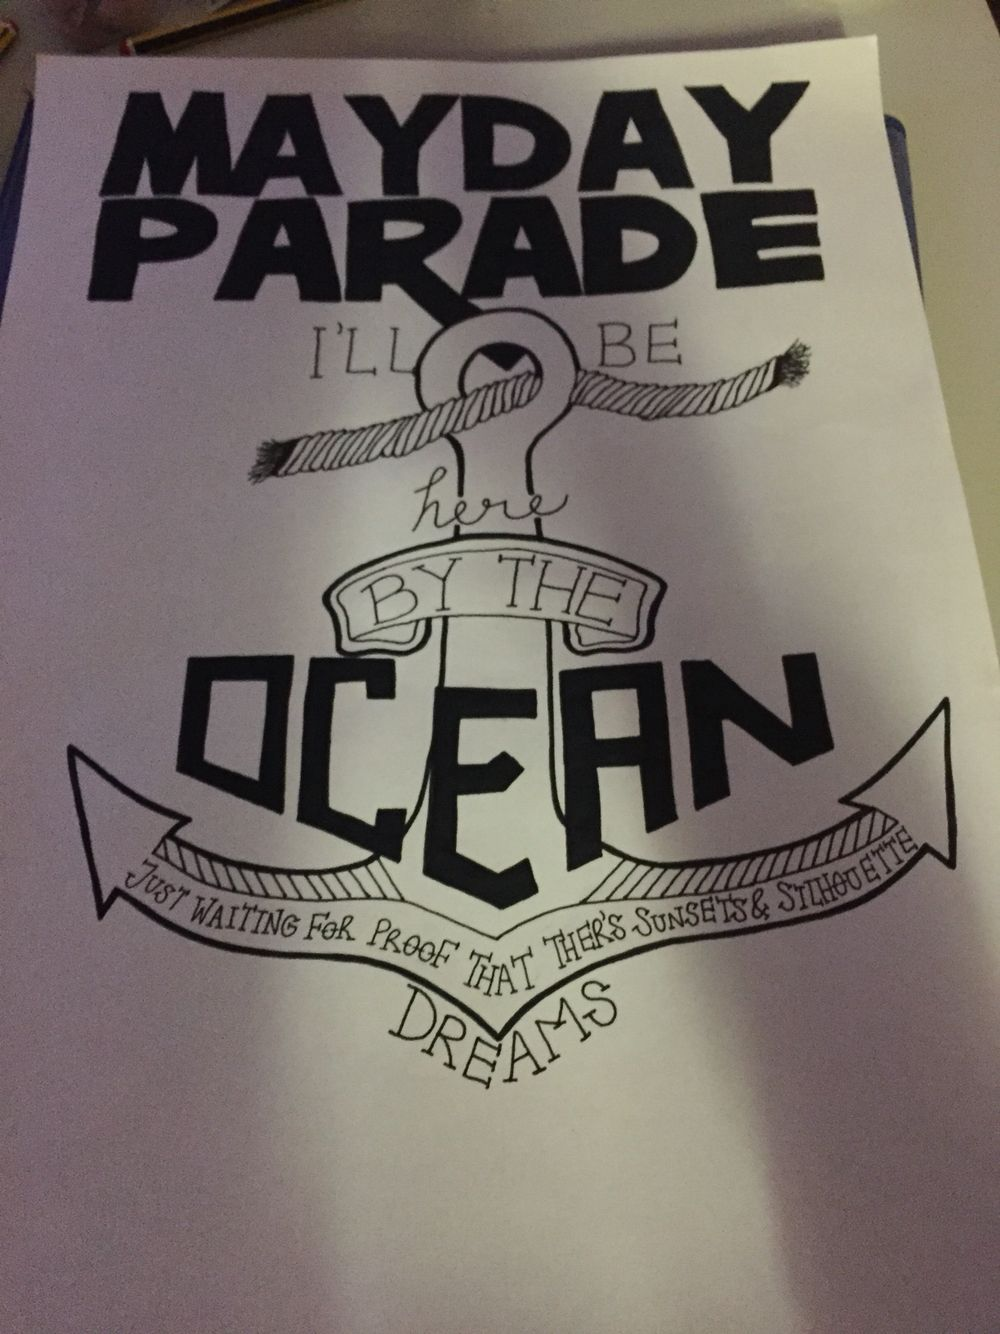 Mayday parade lyrics  By Charley cumberledge